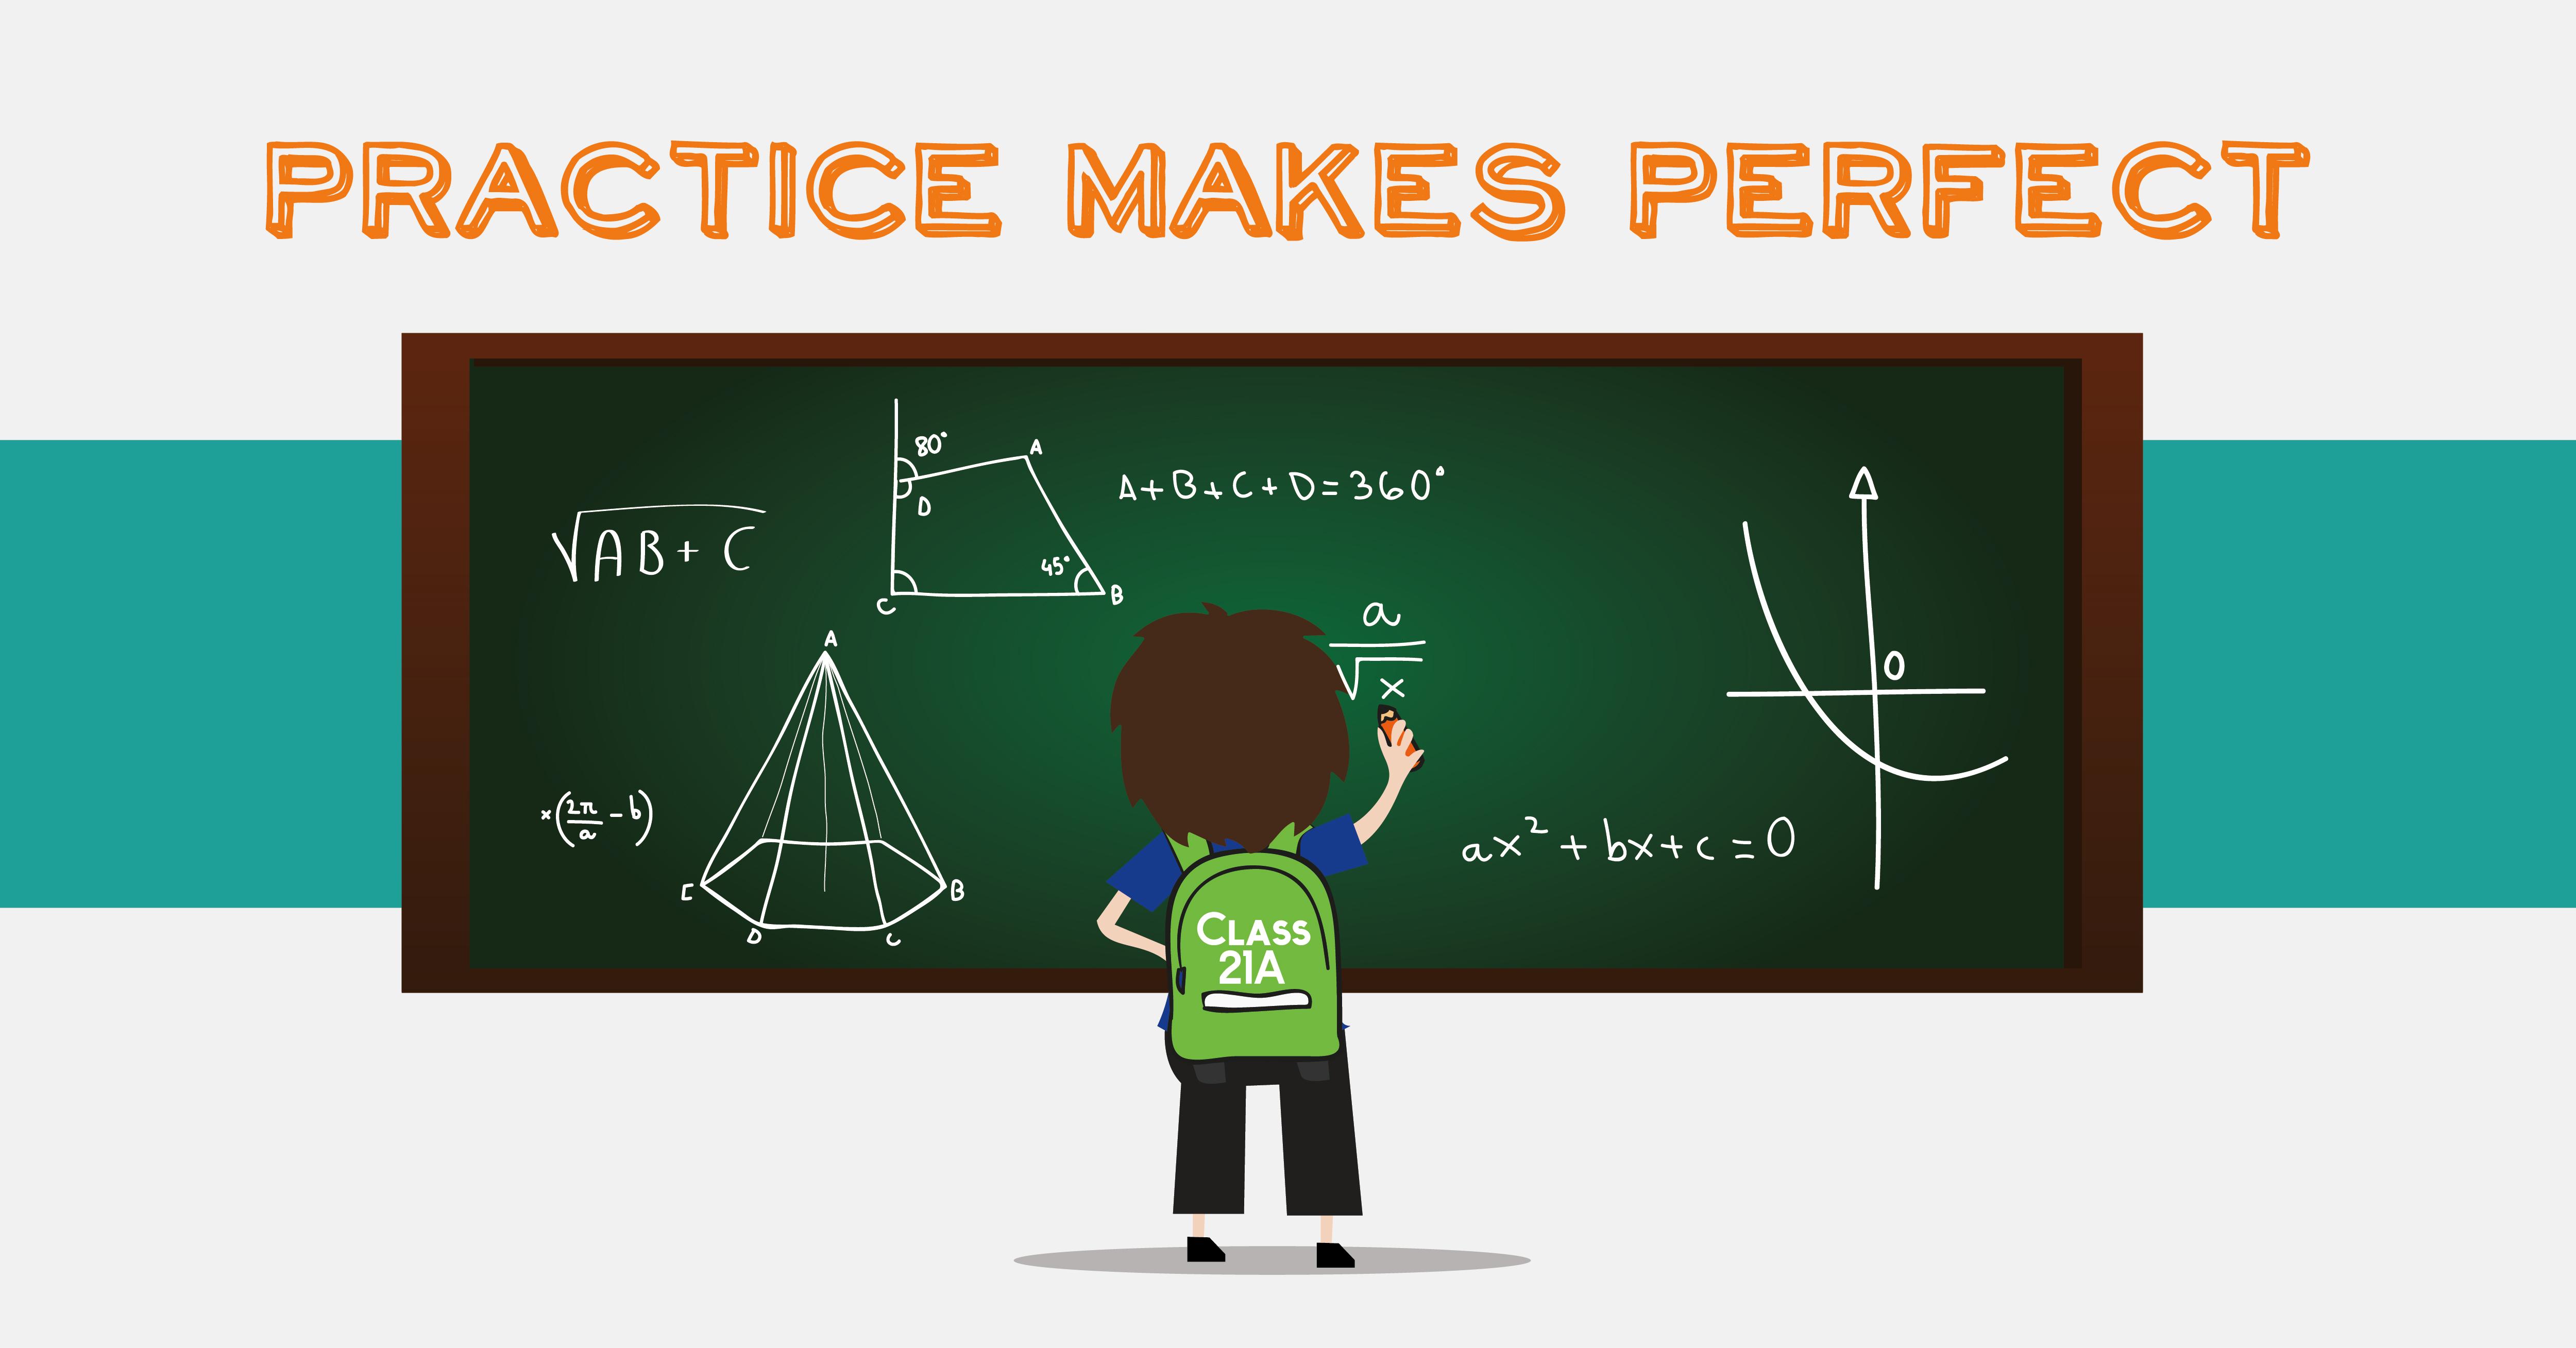 008 Practice Makes Man Perfect Essay Singular In Hindi Full